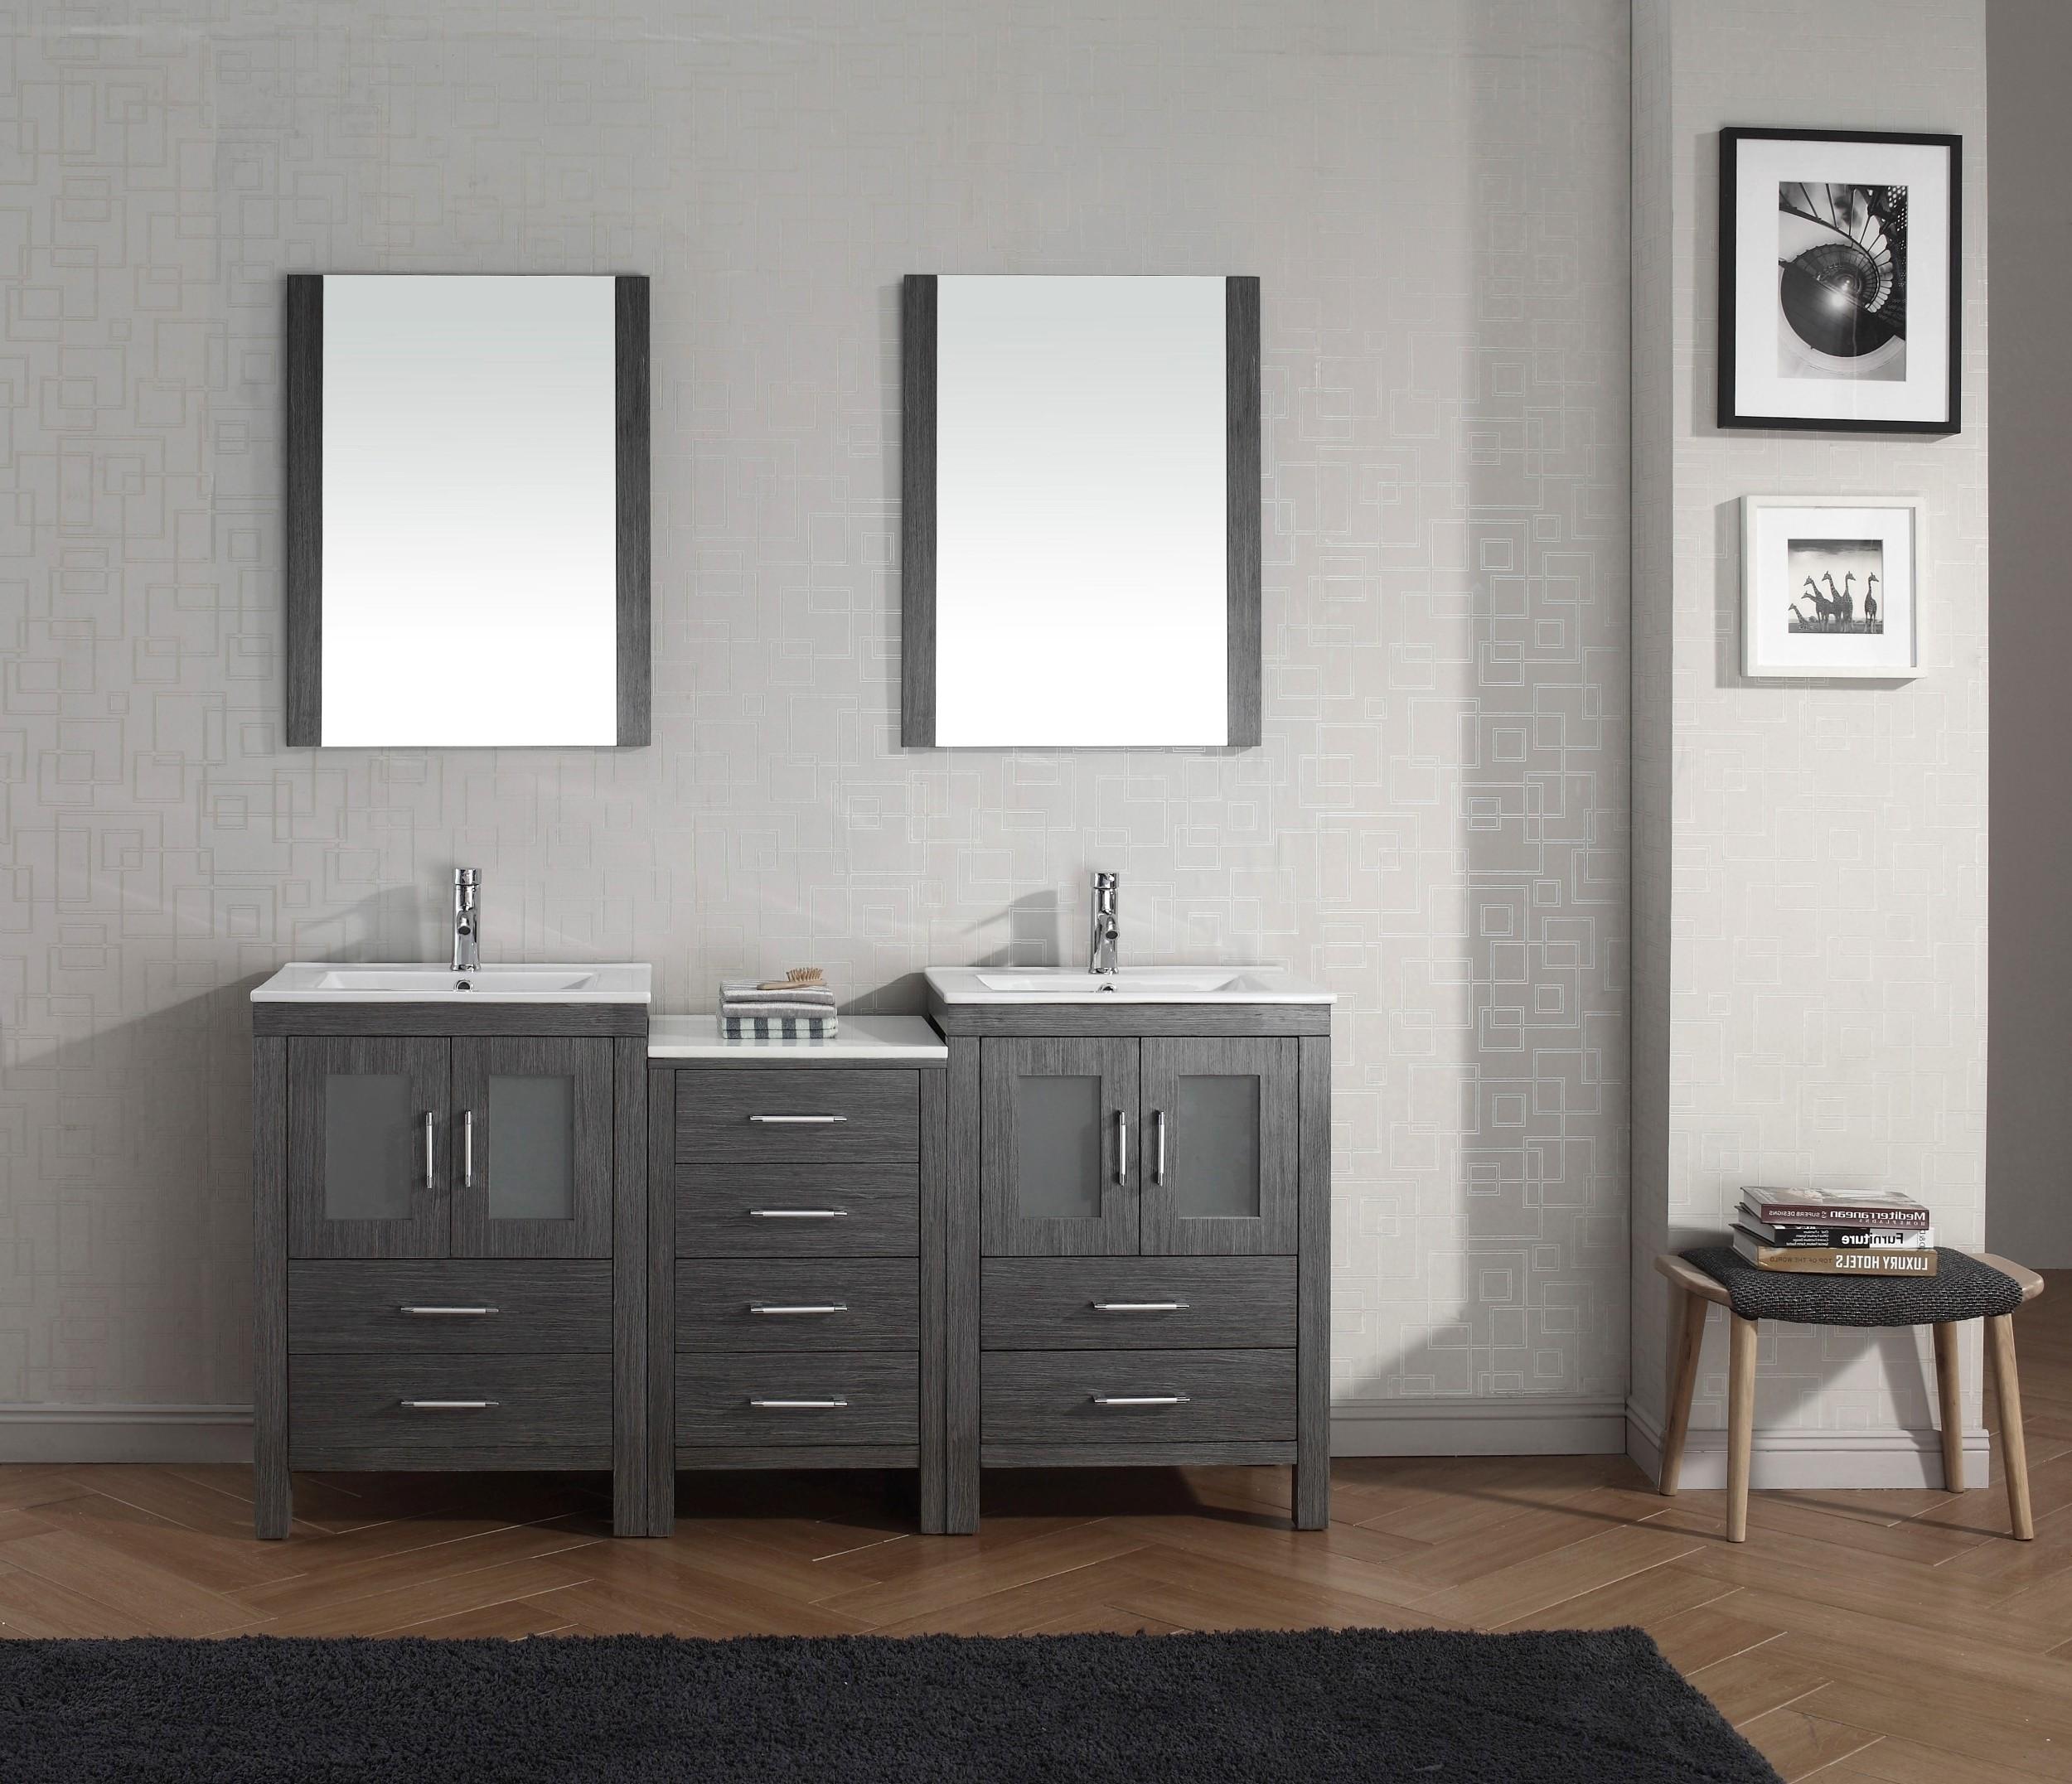 Houzz Bathroom Vanities Lovely Home Accecories Houzz Bathroom Vanities Awesome Ideas A1houston Construction